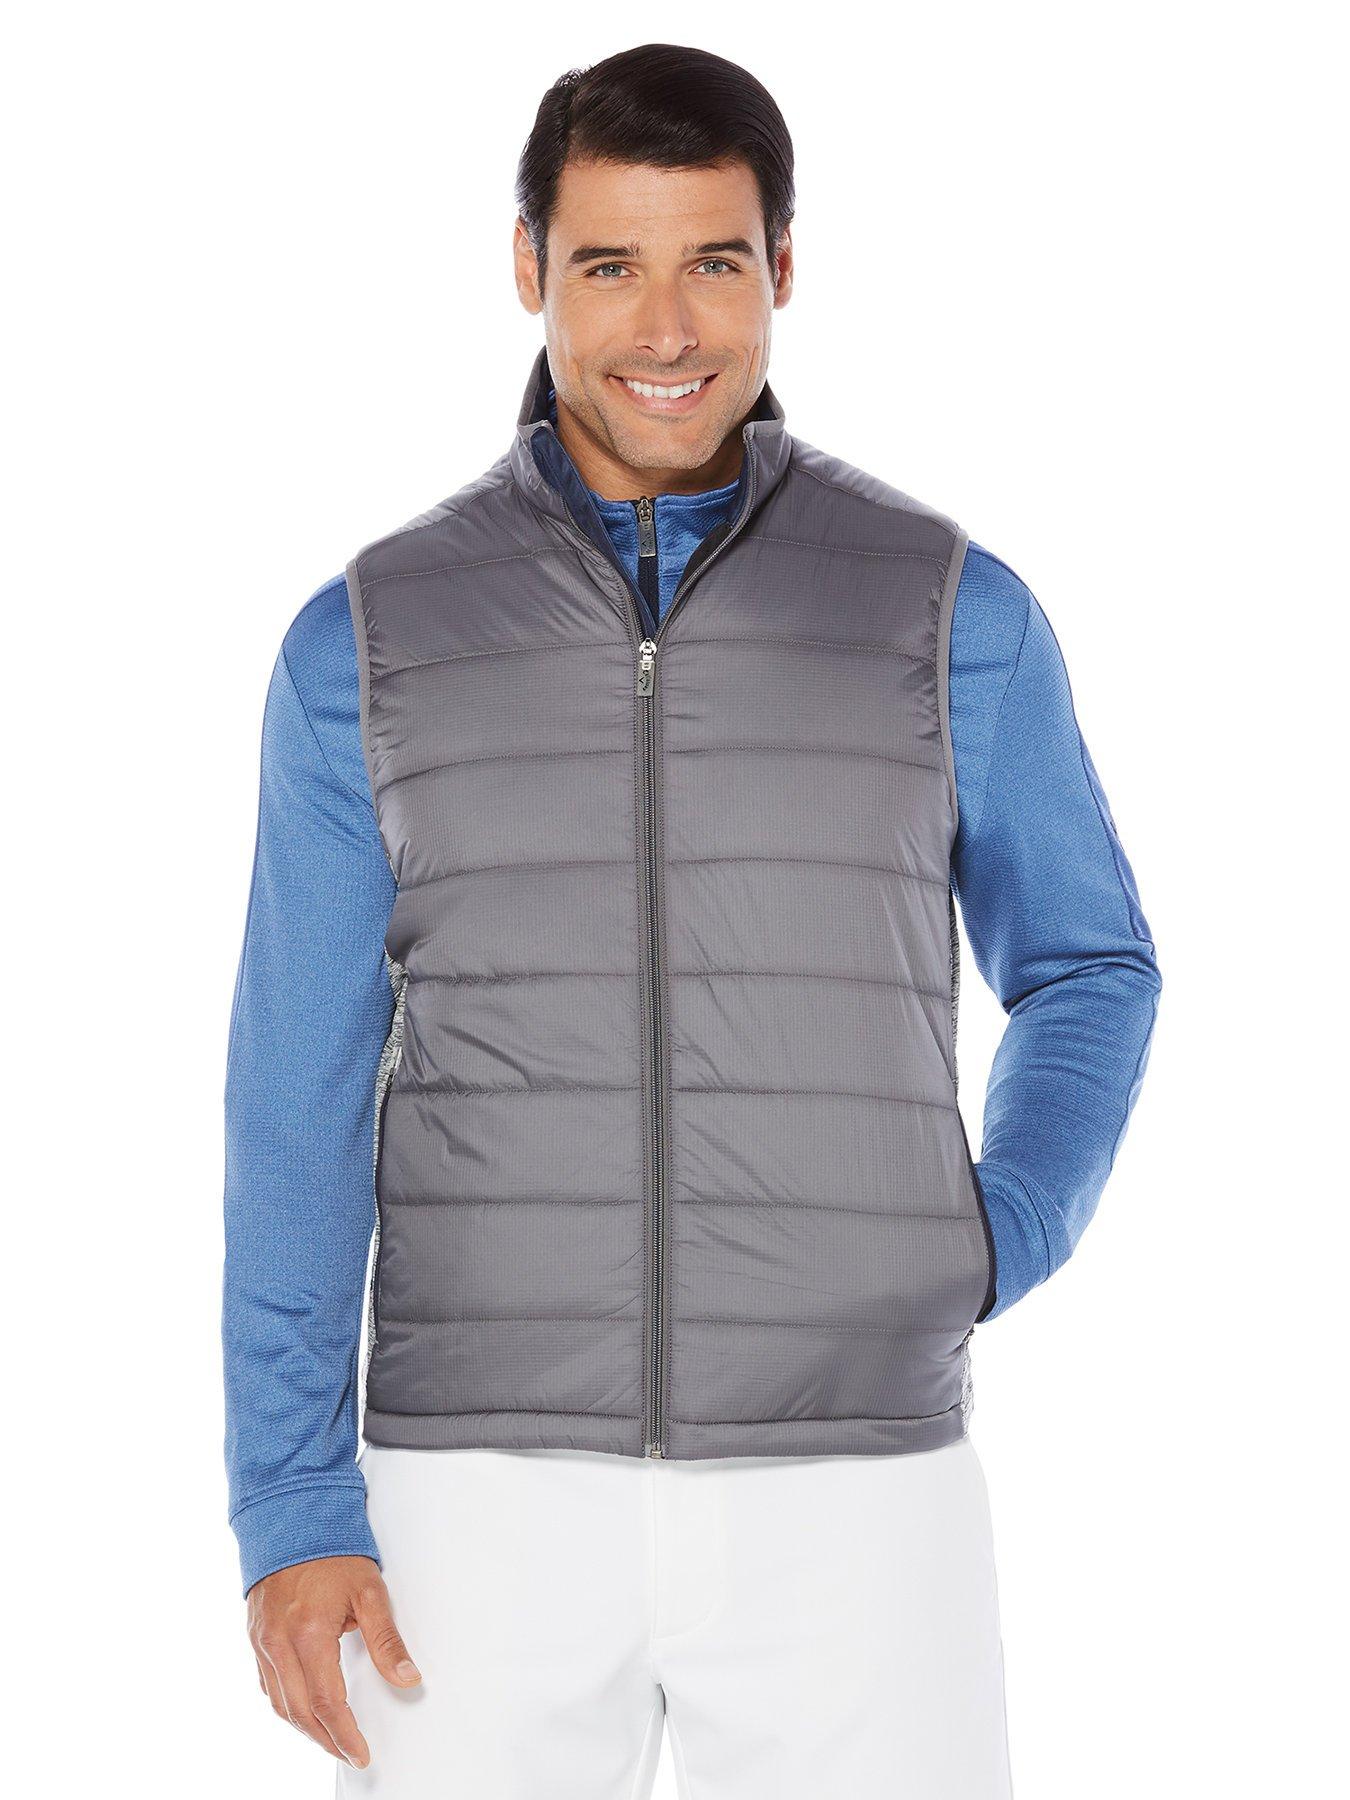 Callaway Men's Opti-Therm Sleeveless Fiber Fill Vest, XX-Large, Medium Grey Heather